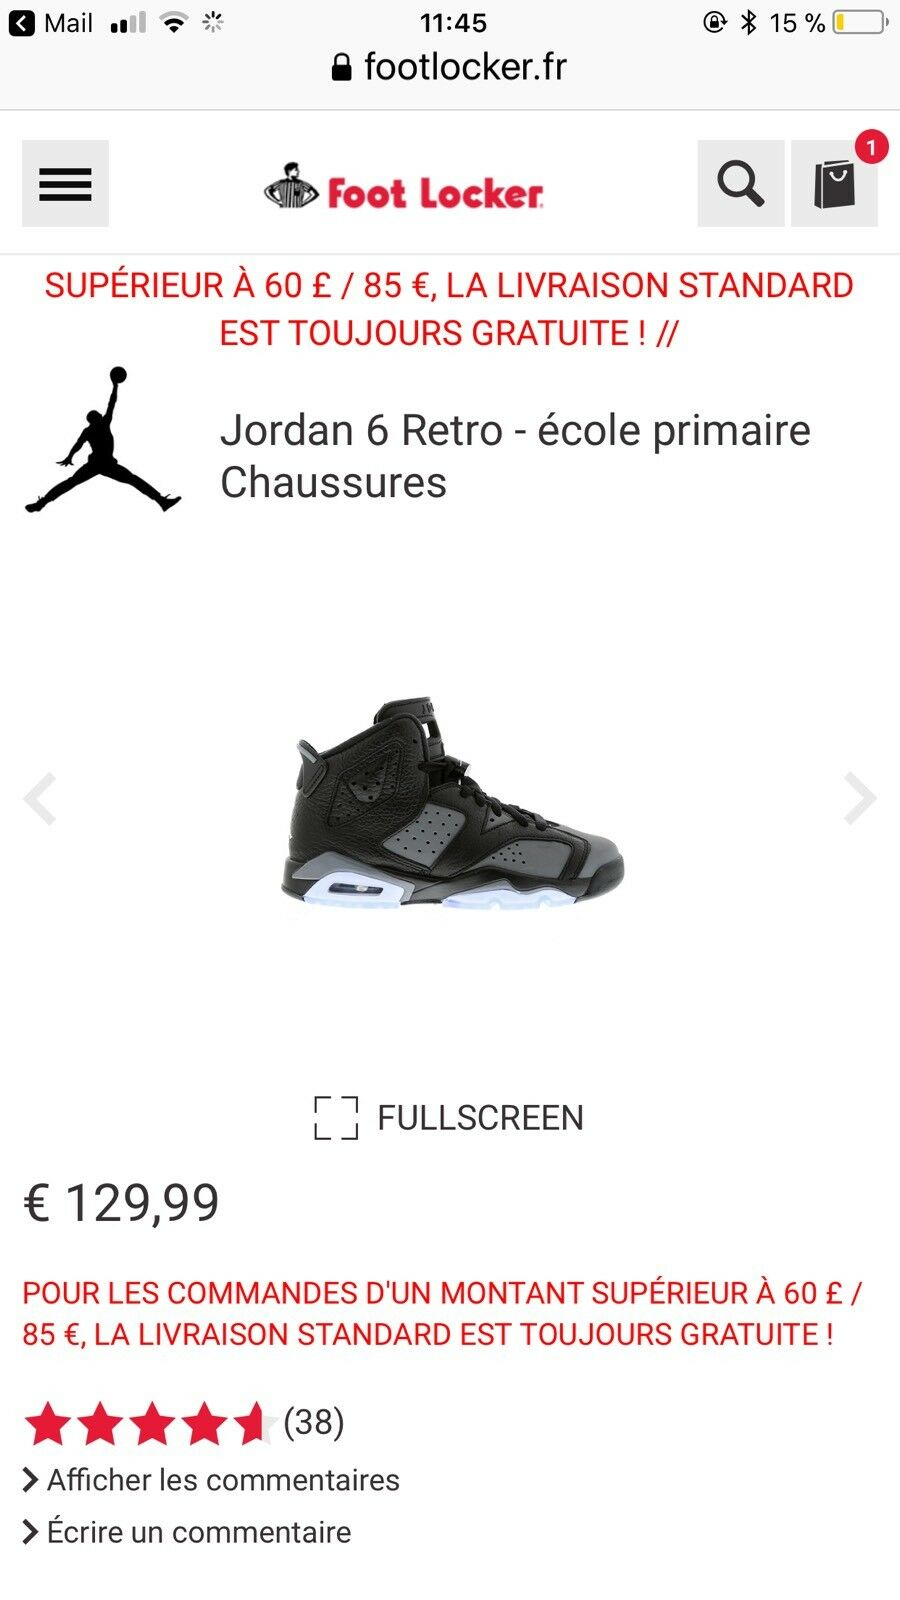 Air Jordan 6 Size Retro BG 384665 010 Size 6 5;5,5;6;6,5,7y(37,5; 38;38,5;39;40) 2a8e02